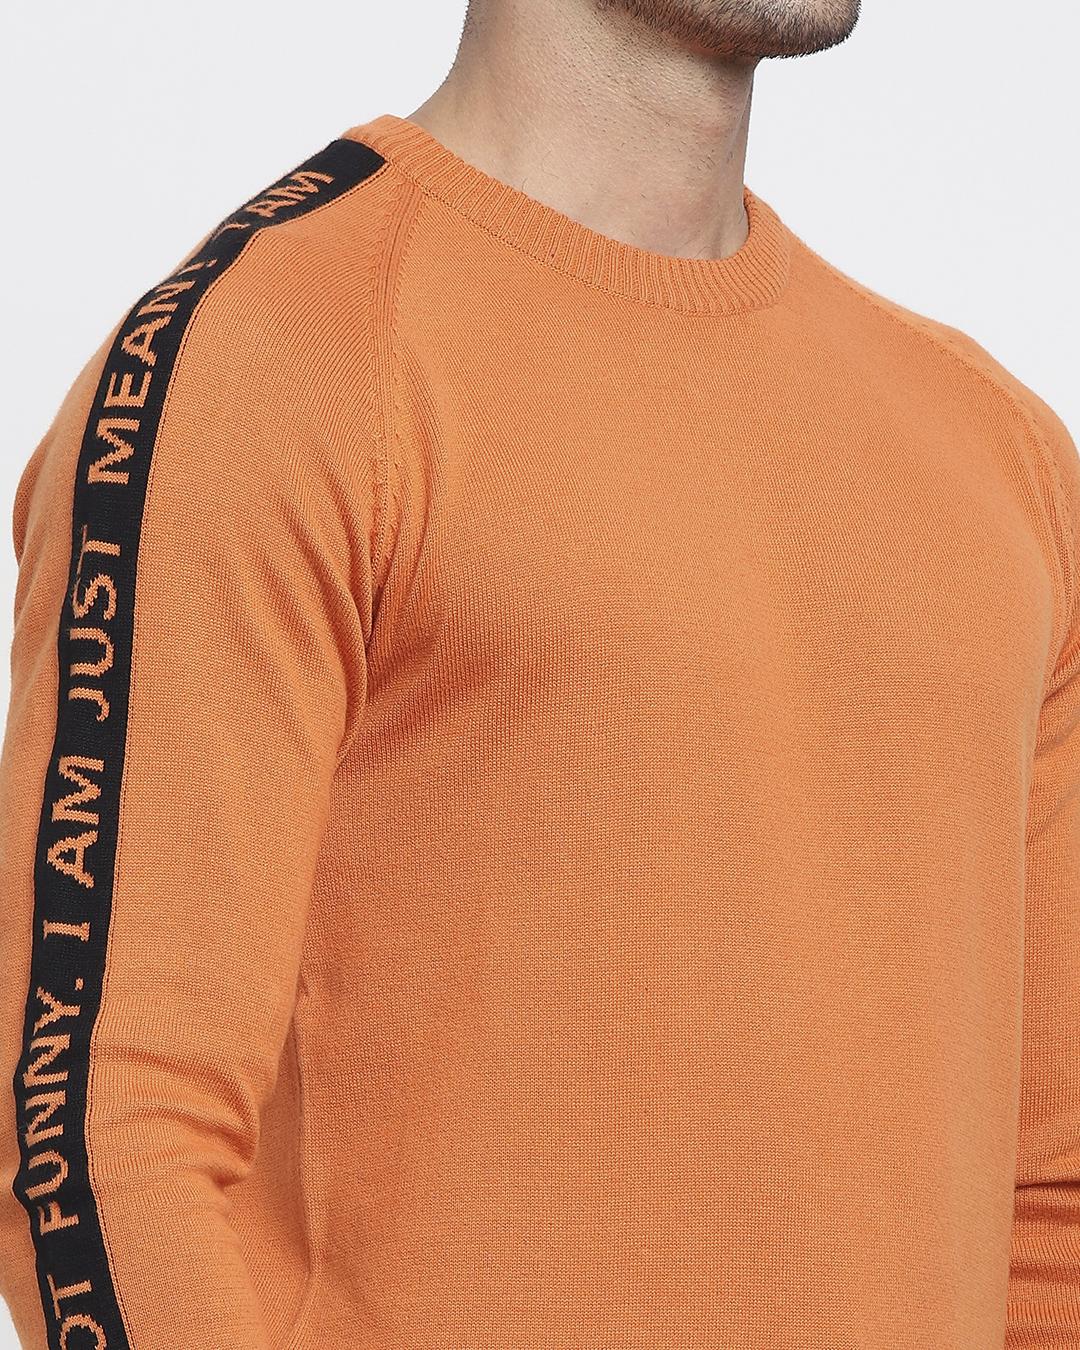 ShopBurnt Orange Shoulder Panel Flat Knit Sweater-Full